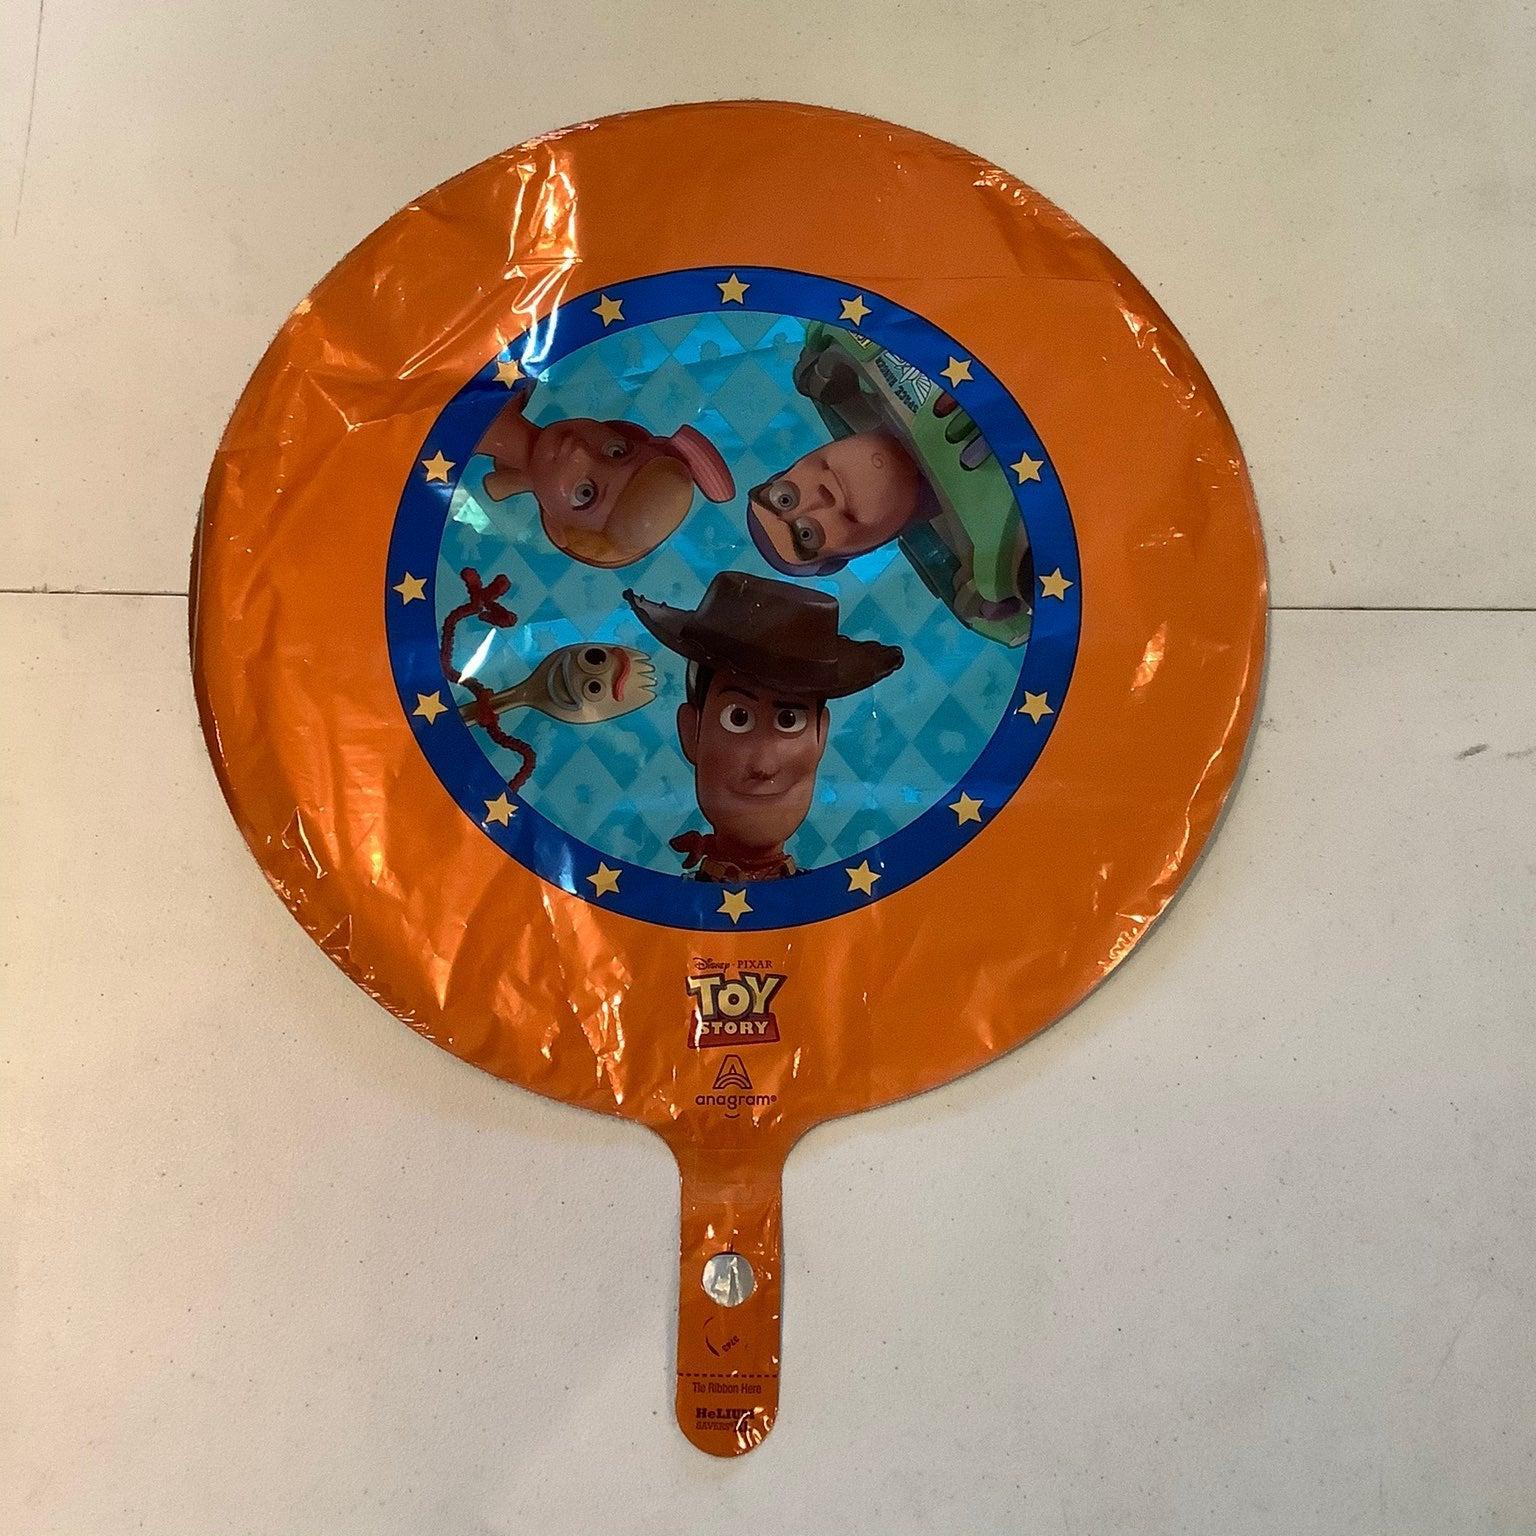 Pixar Toy story 4 mylar ballon